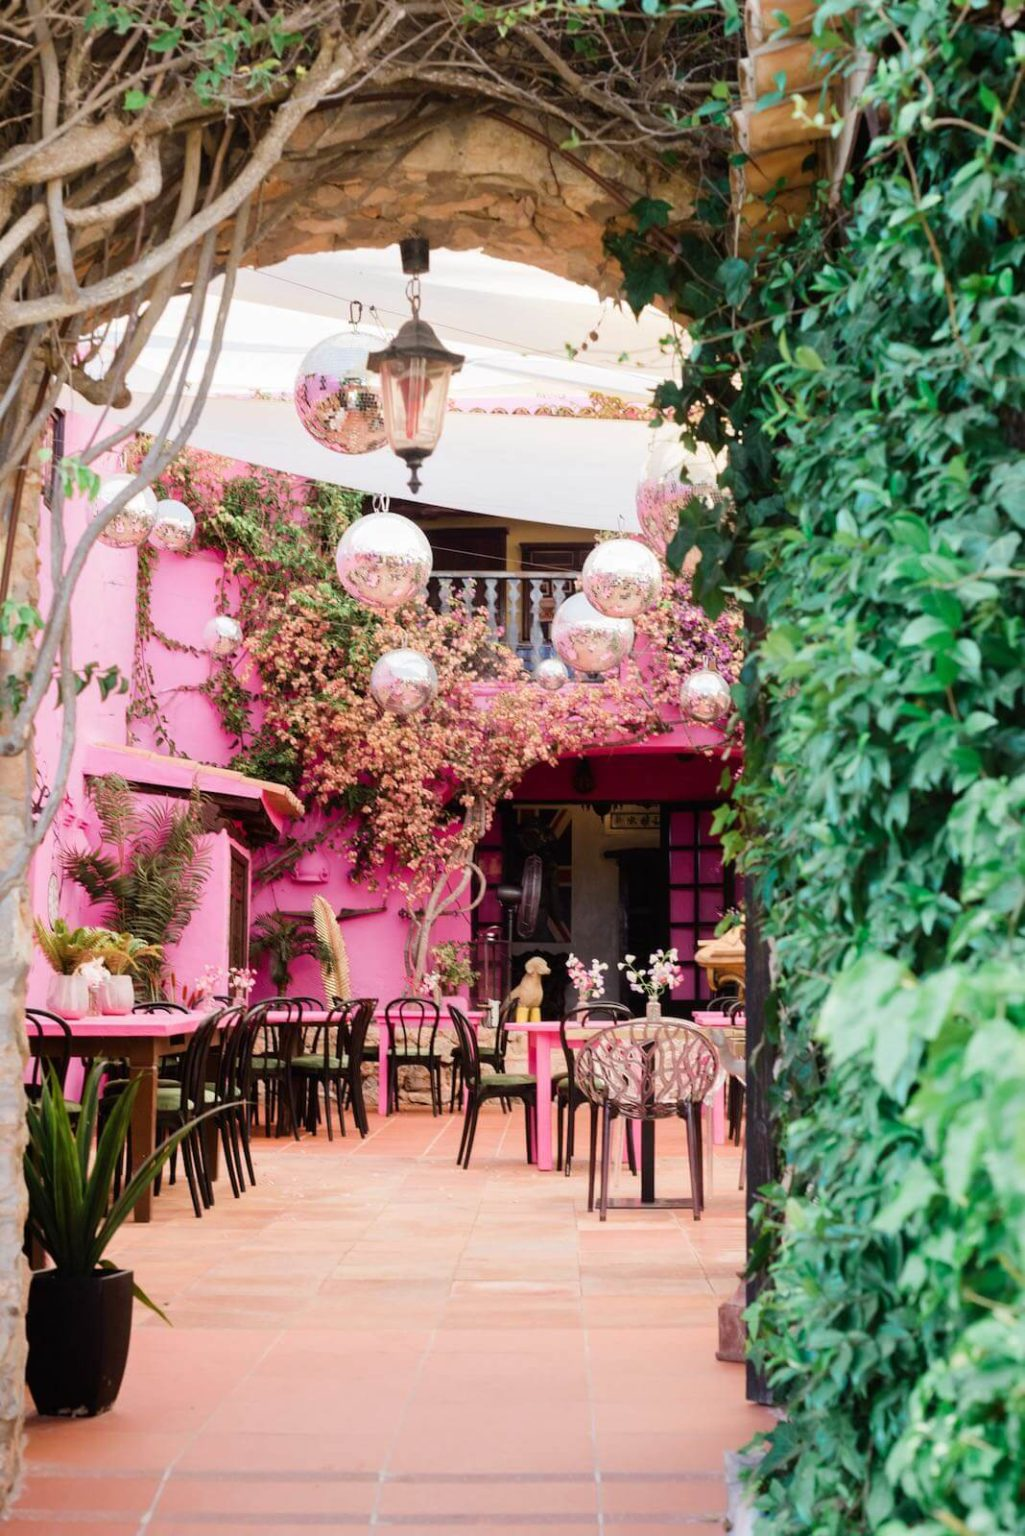 https://www.white-ibiza.com/wp-content/uploads/2020/03/ibiza-restaurant-pamelas-at-pikes-ibiza-2020-11-1025x1536.jpeg